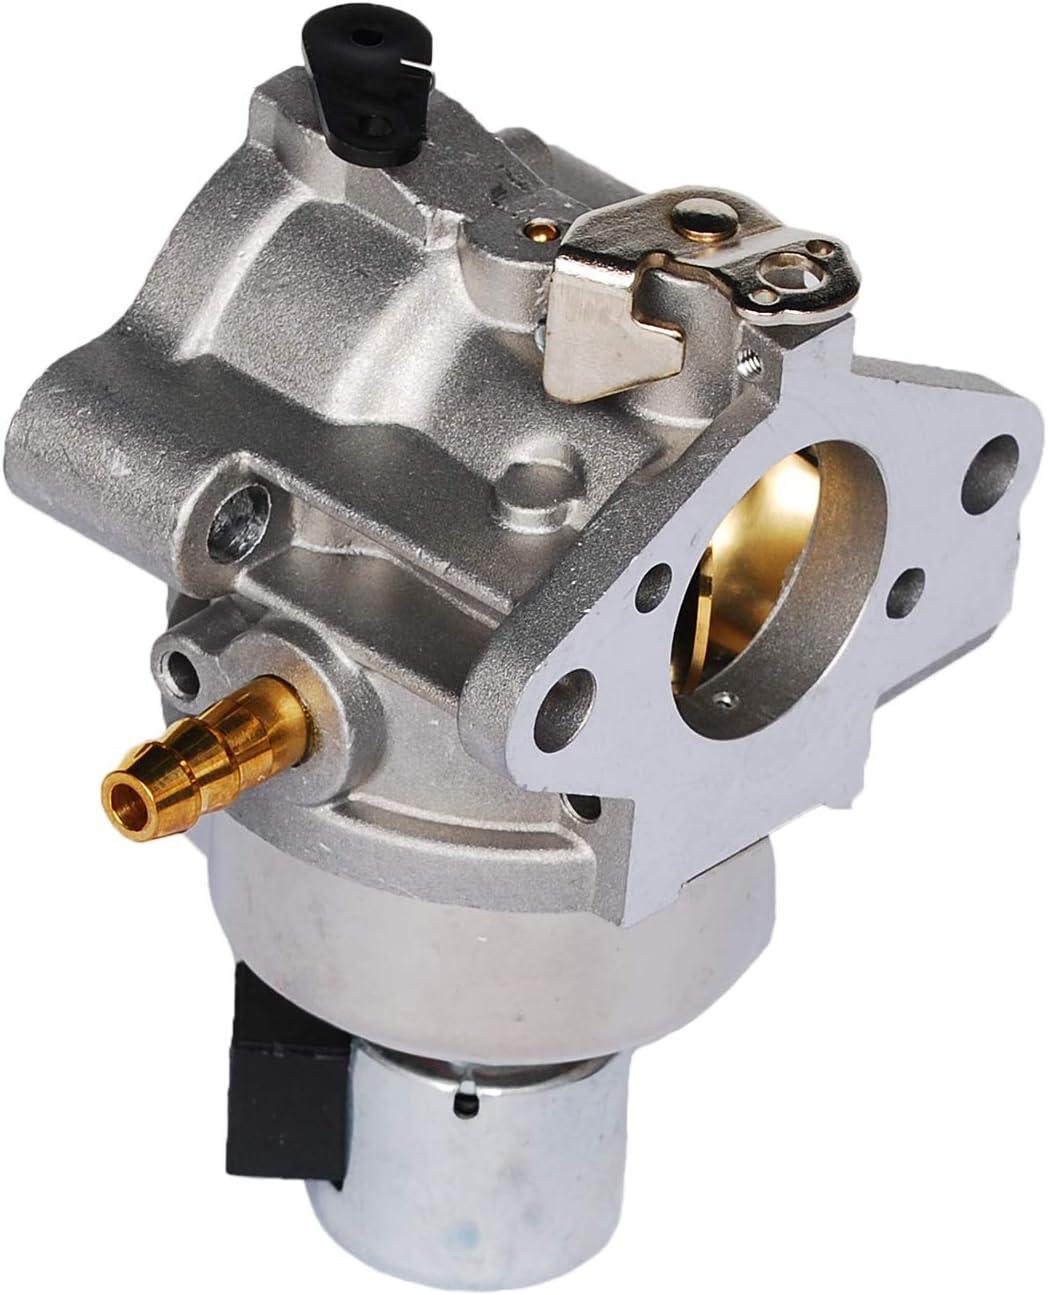 Amazon.com: hifrom carburador Carb Kit de con revisión de ...